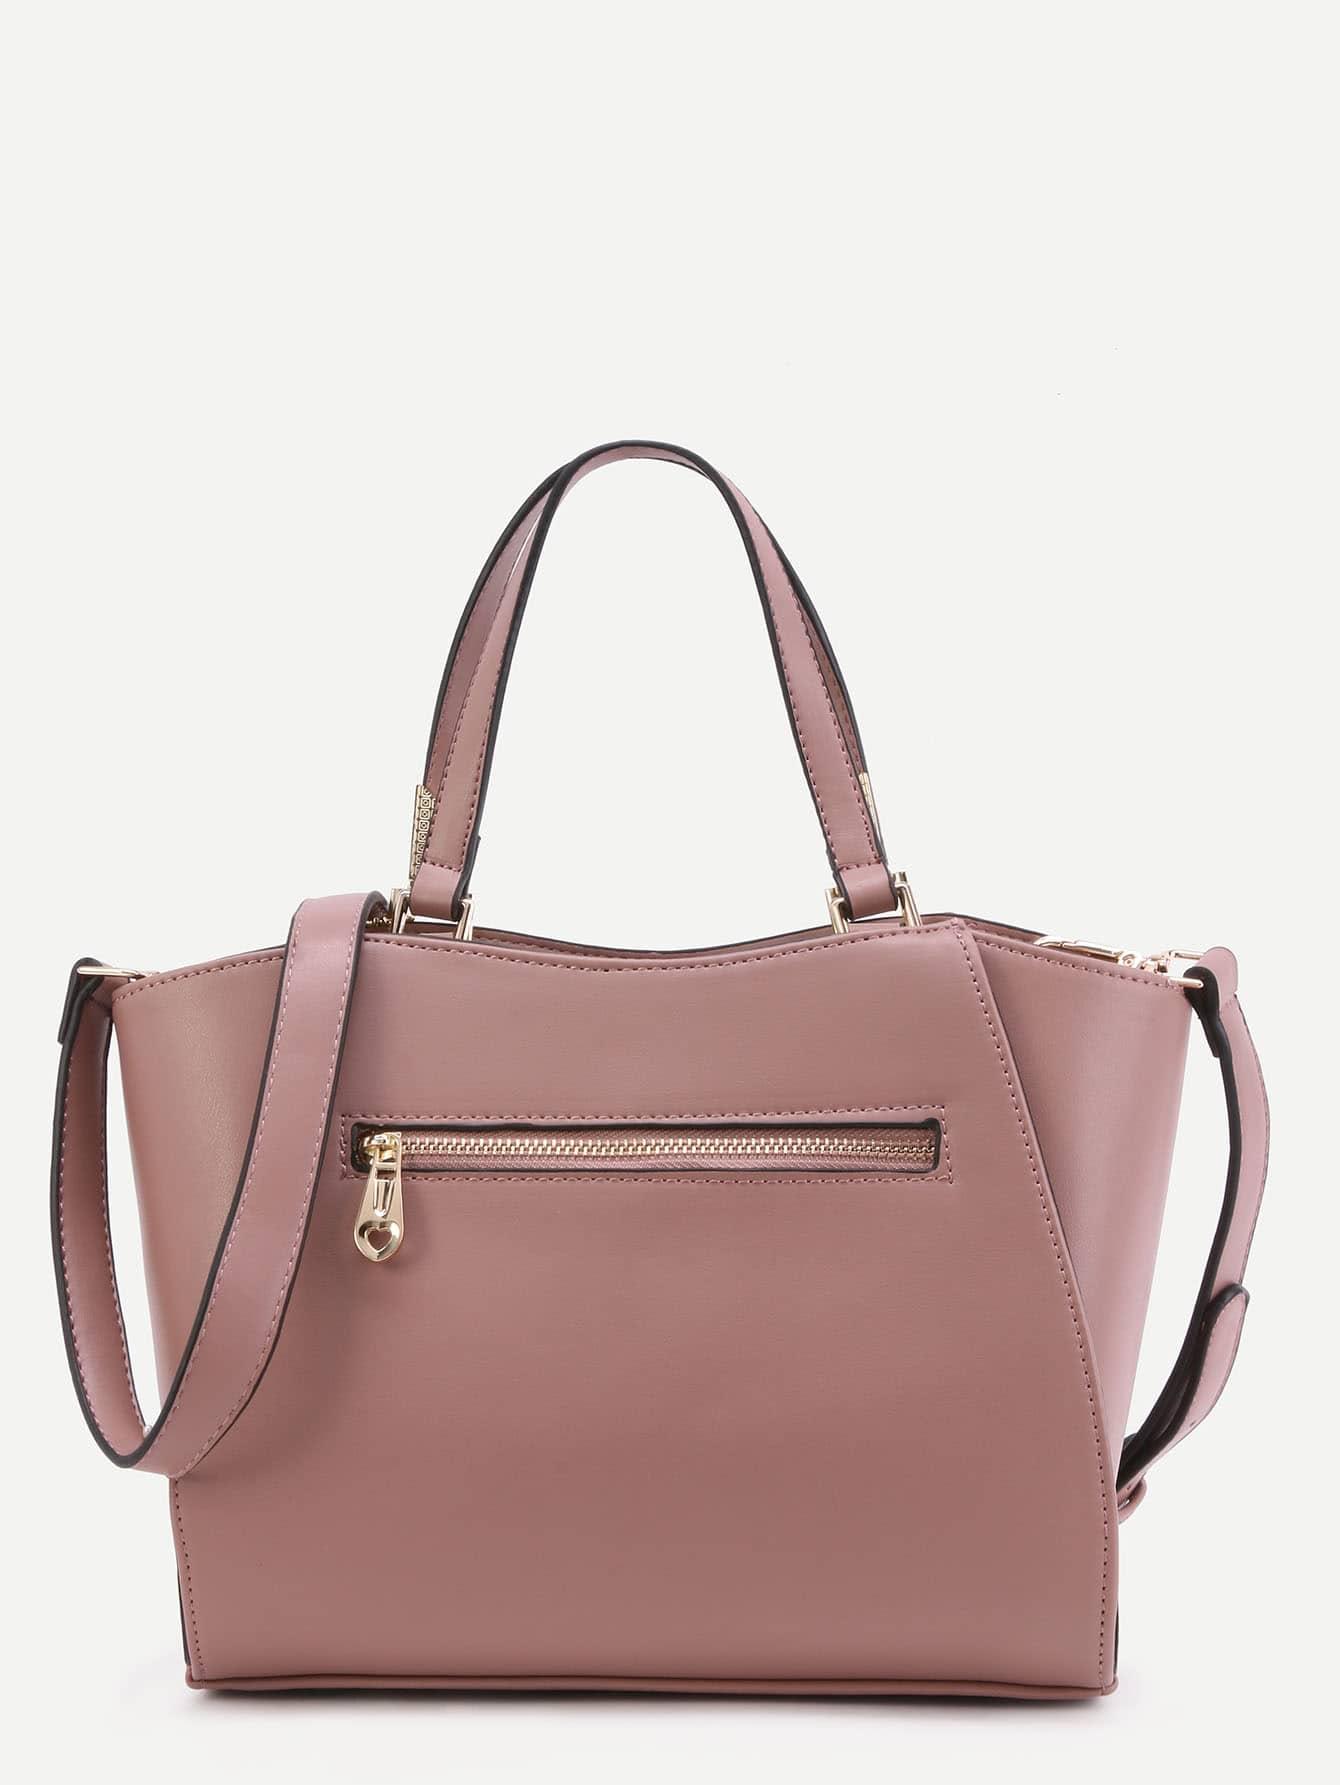 bag160928907_2